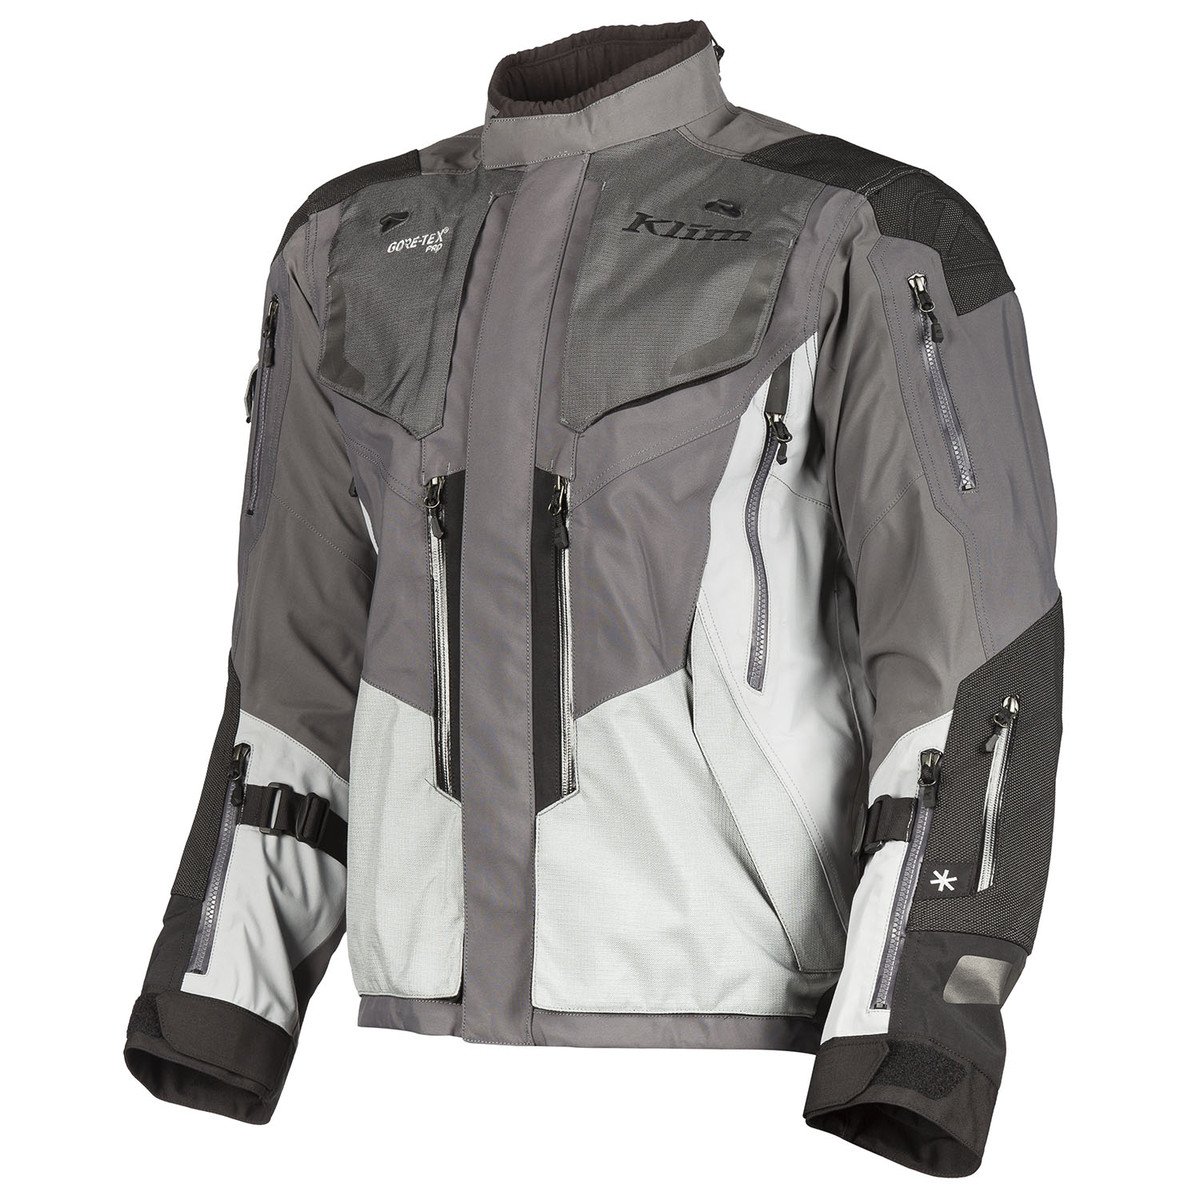 Badlands Pro Jacket Light Gray